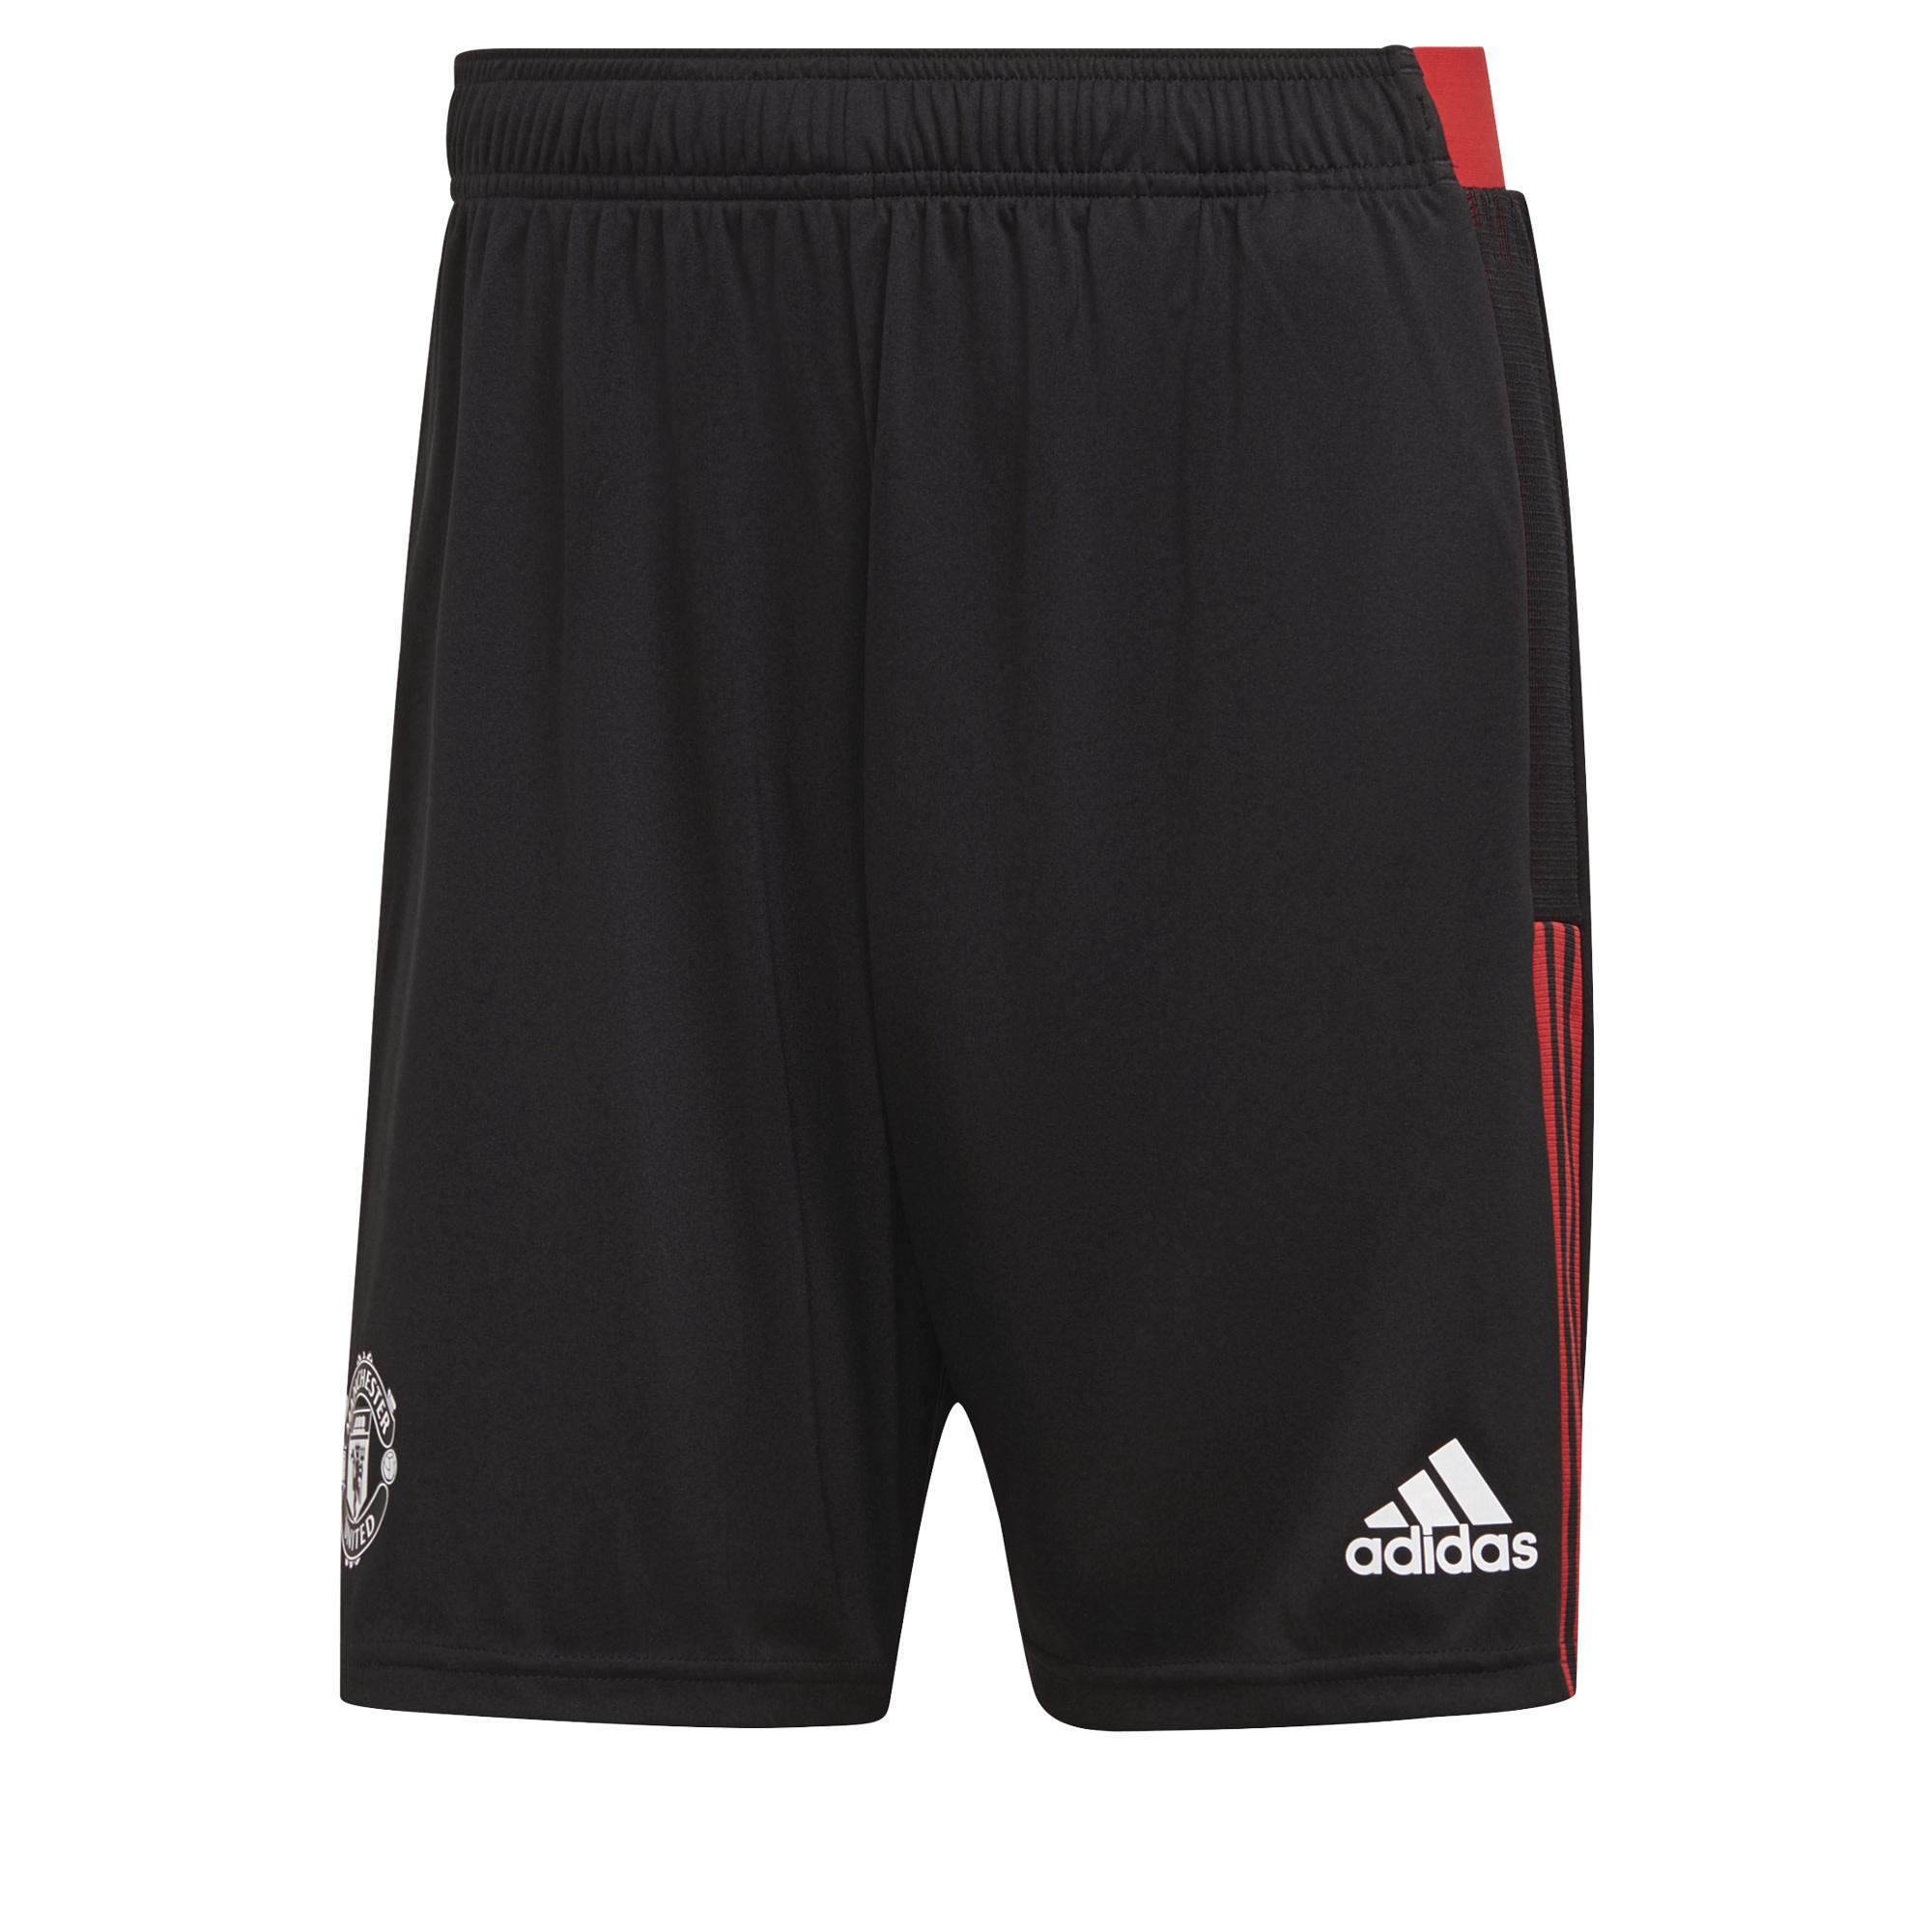 Adidas Man United Training Short